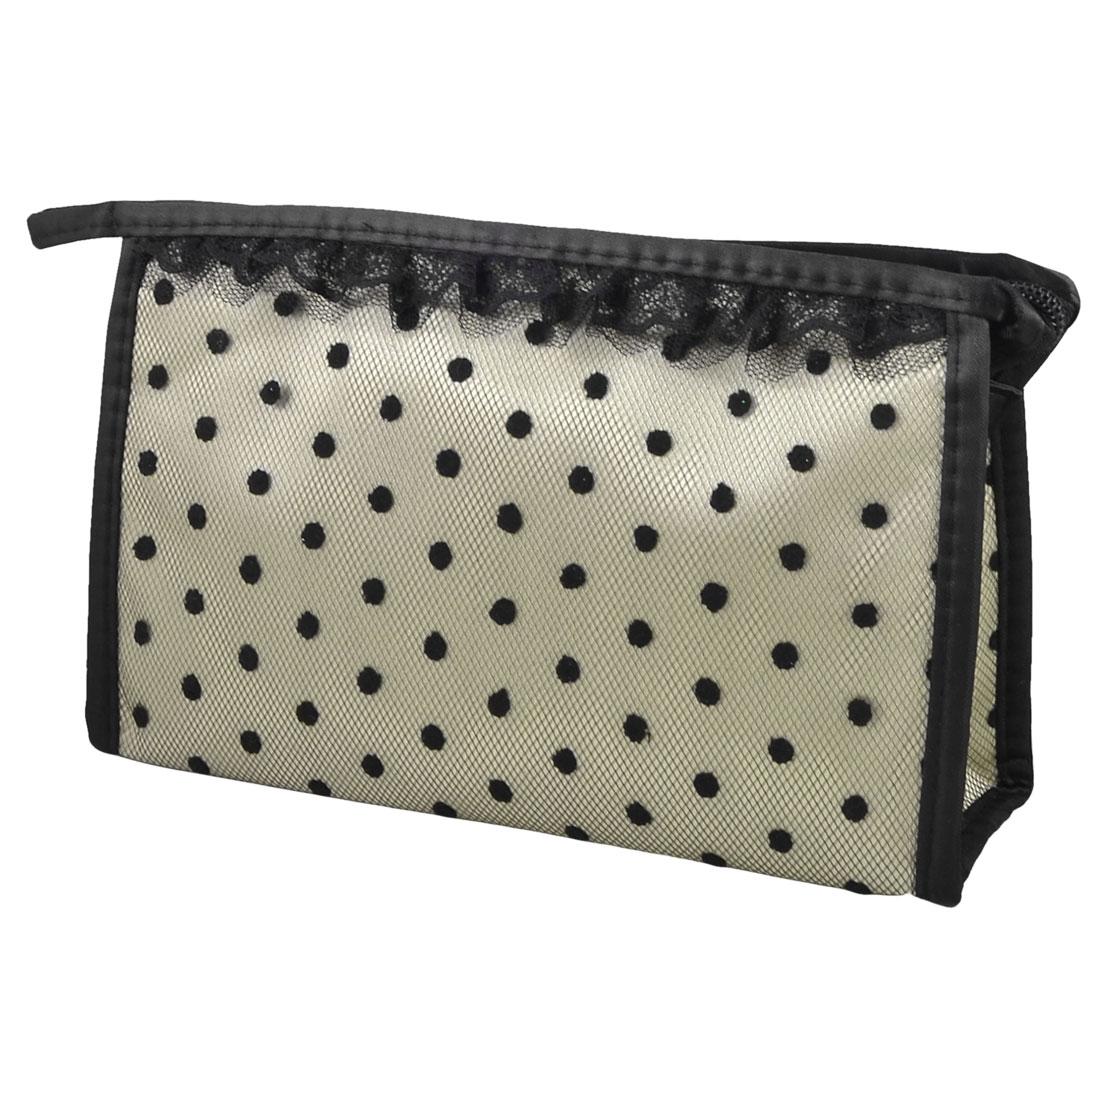 Zipper Closure Rectangle Lace Dots Mesh Makeup Cosmetic Bag Case Pouch Light Gray Black